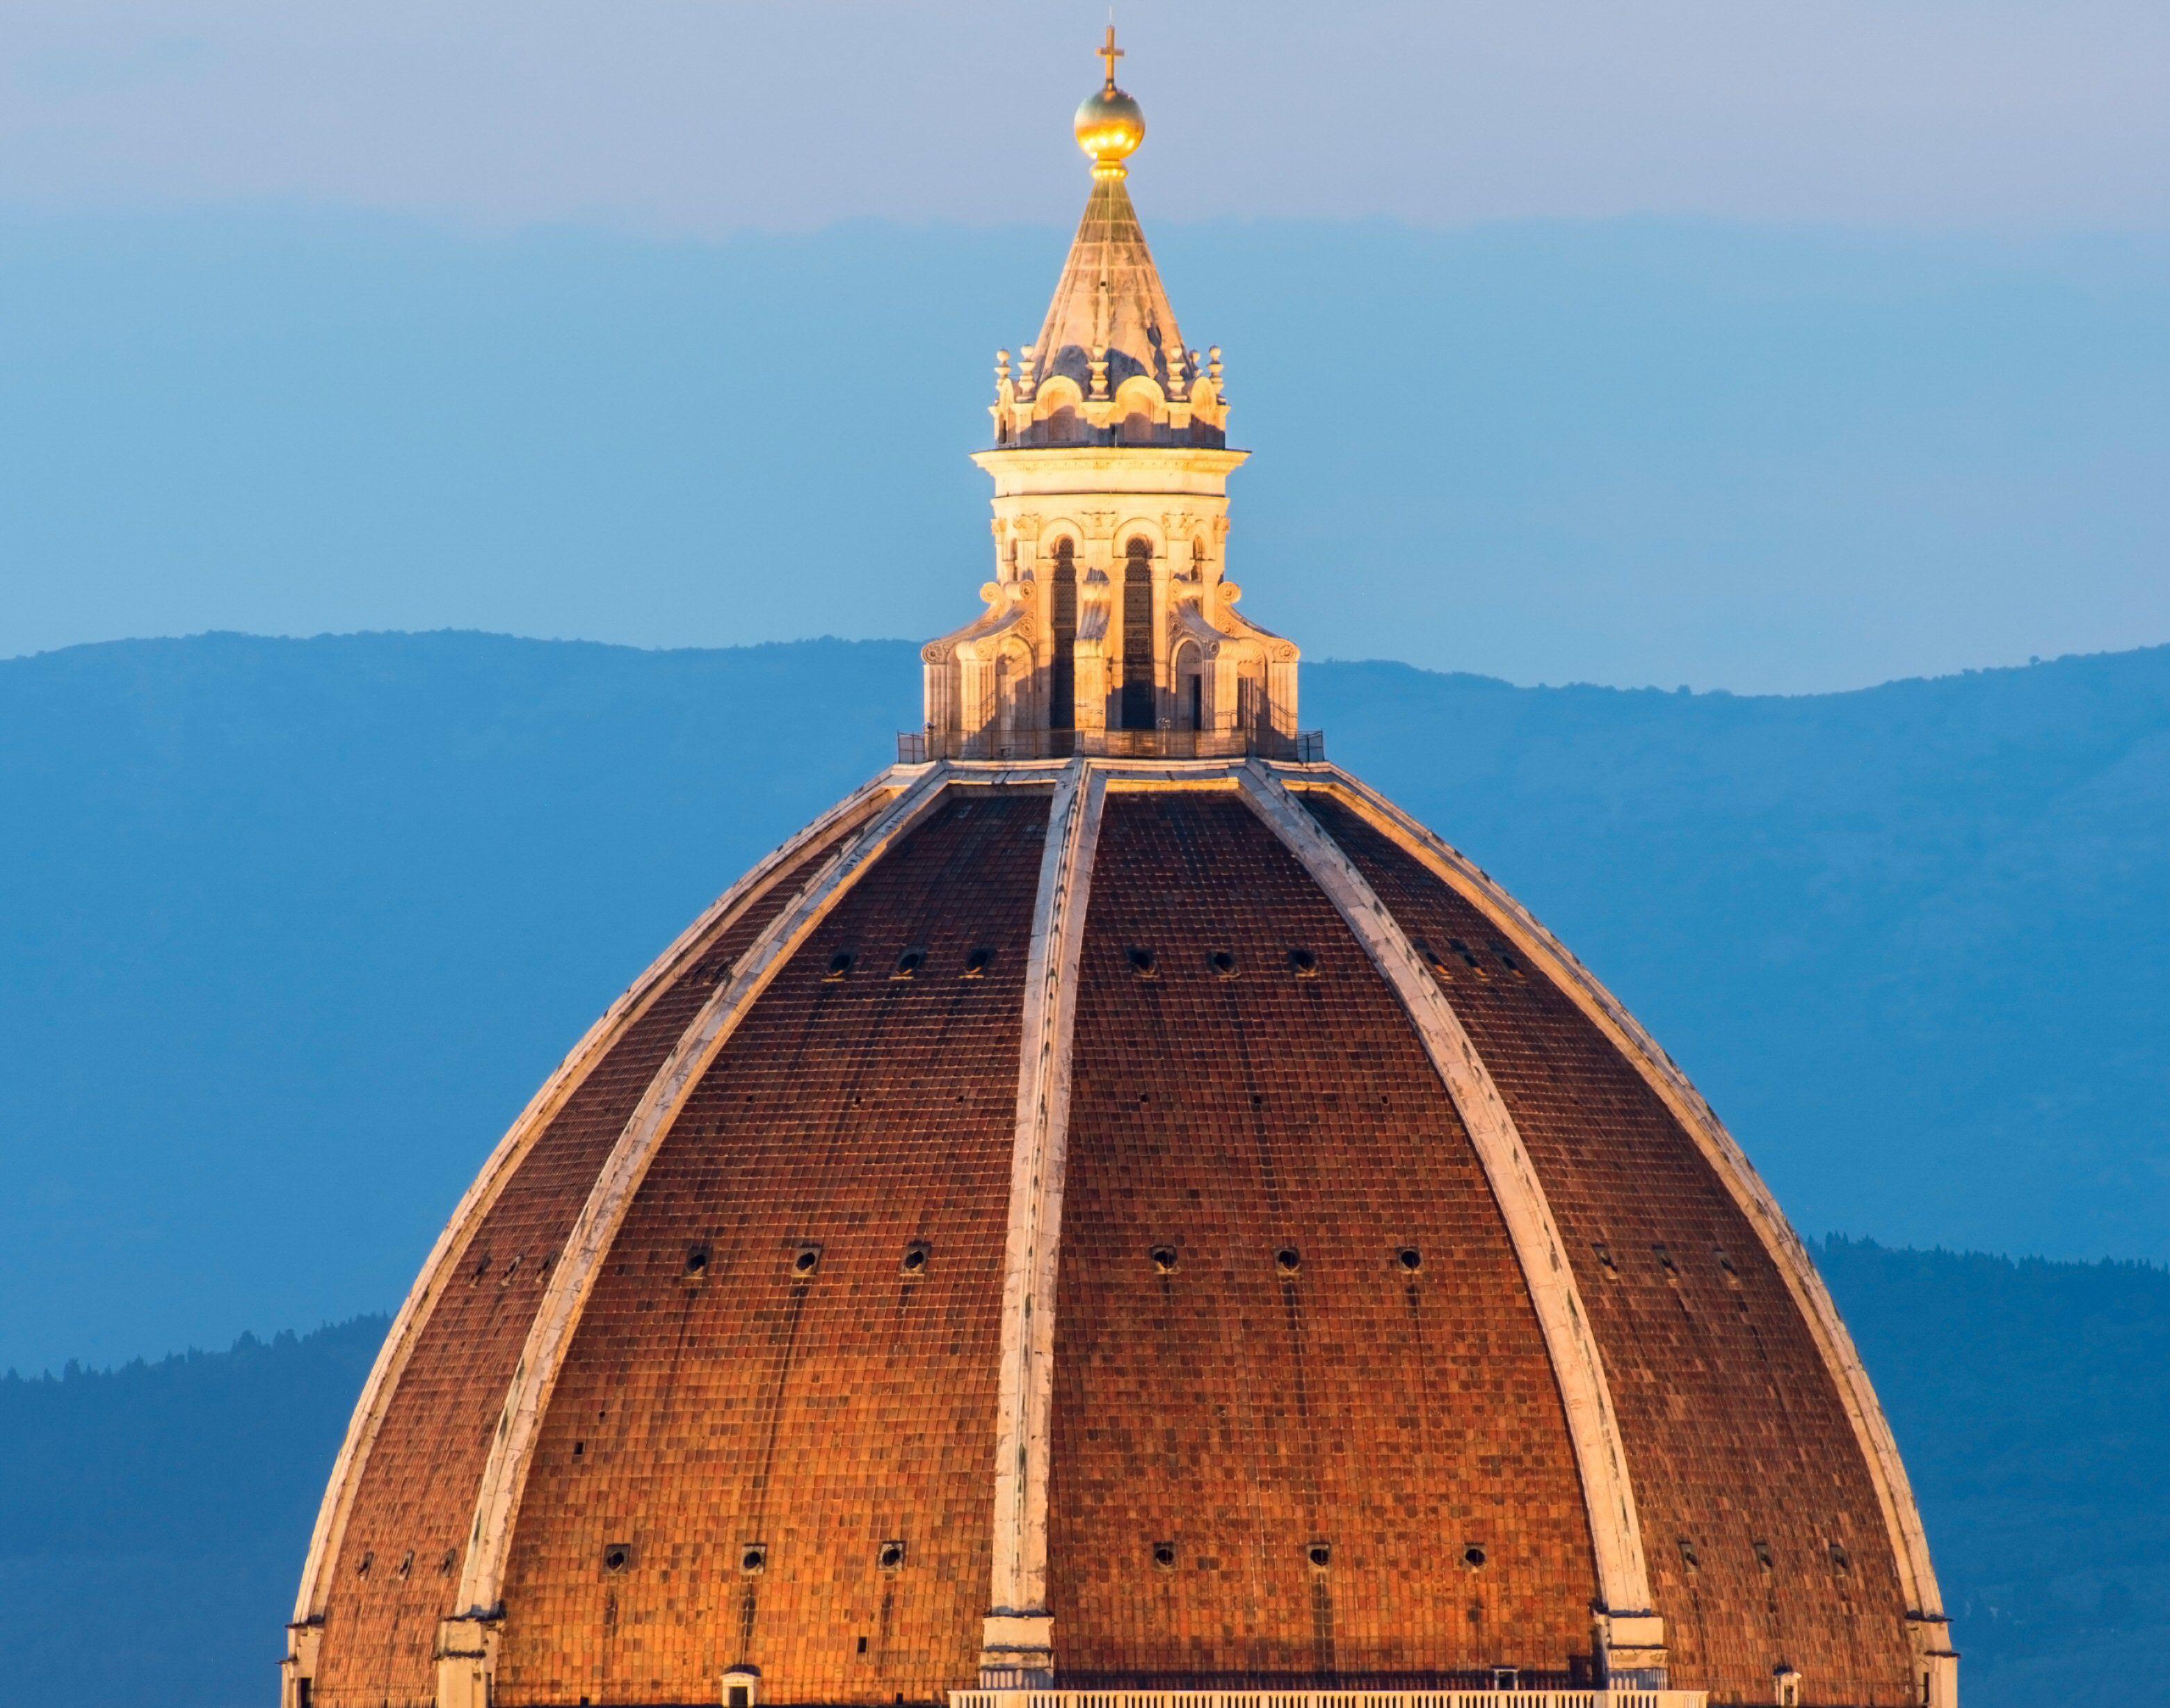 Lantern cupola atop Brunelleschi's Dome, Florence, Italy, c. 1460